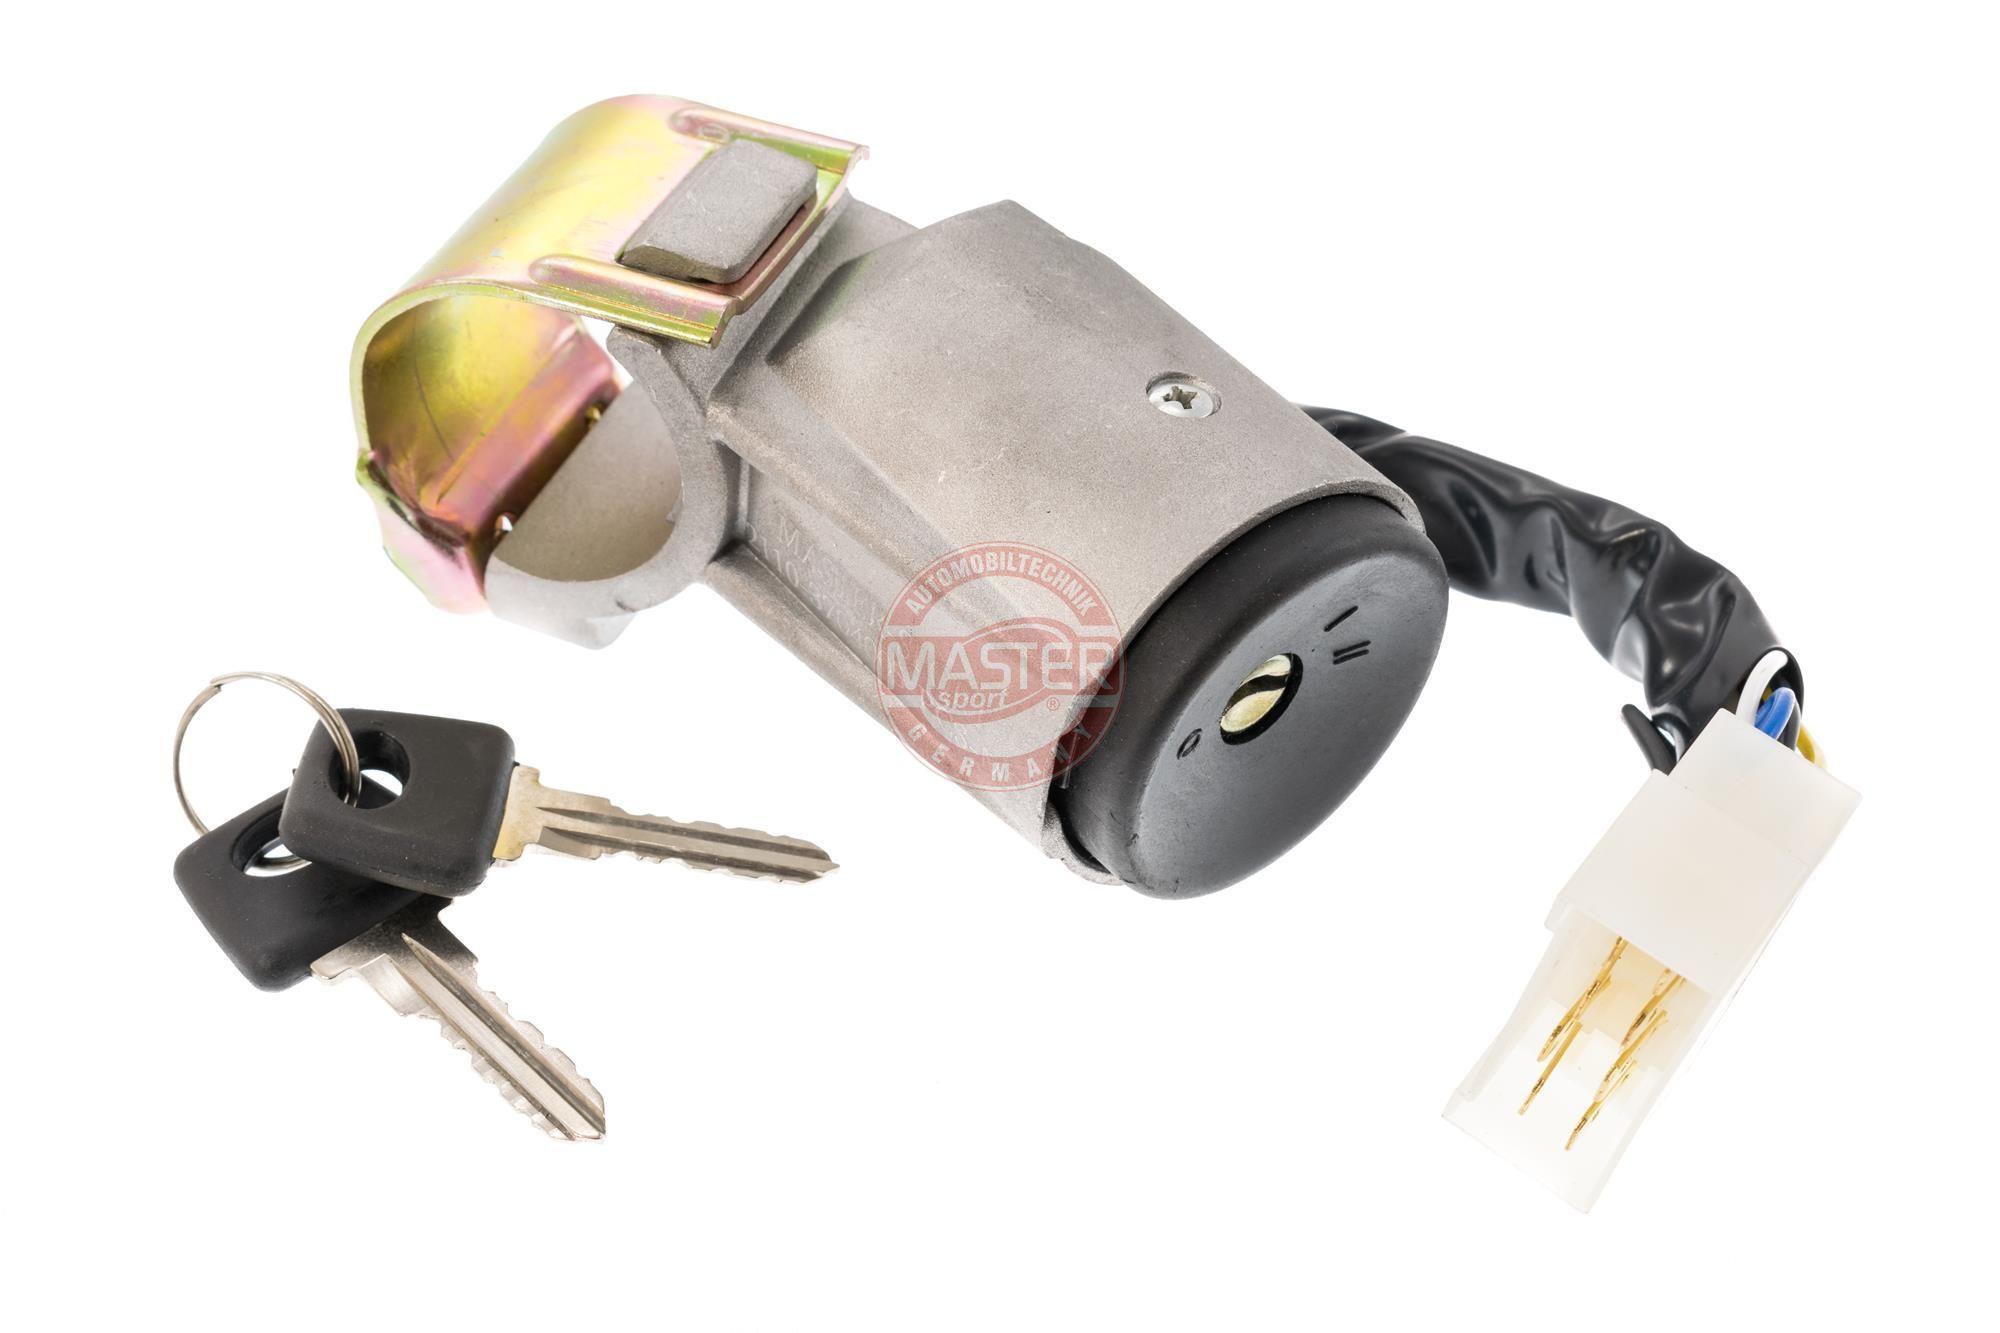 Ignition- / Starter Switch 2110-3704005-PCS-MS MASTER-SPORT 2110-3704005-PCS-MS original quality